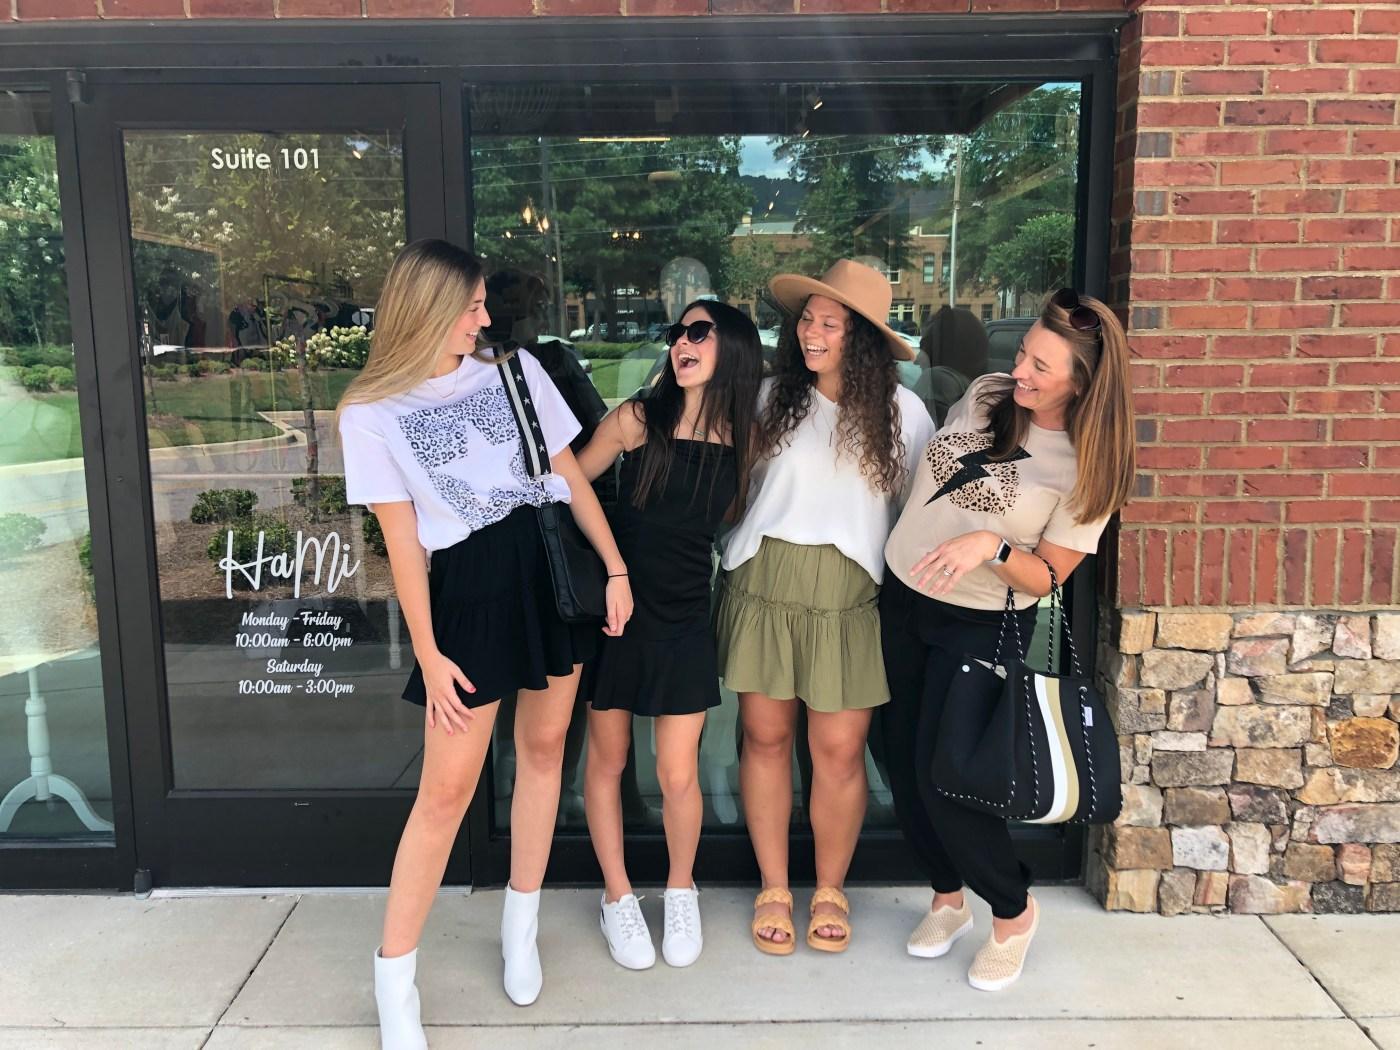 HaMi Boutique - Birmingham summer trends